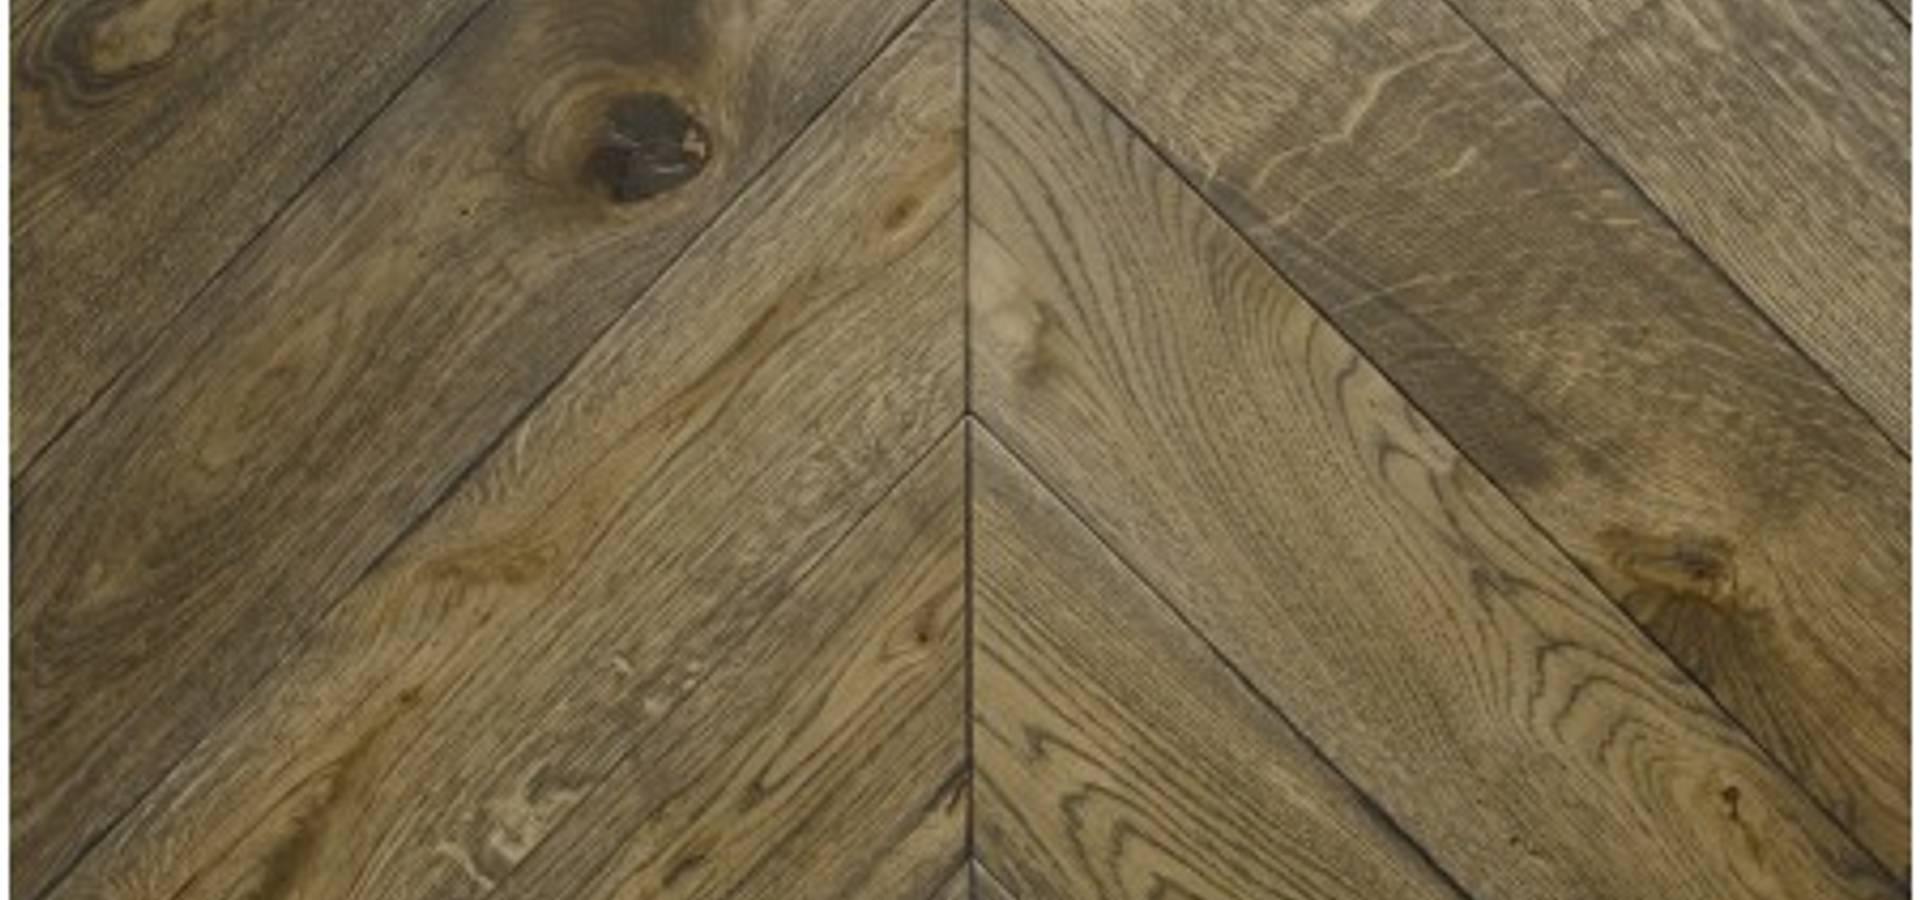 Chevron wood flooring by tomson floors glasgow homify for Hardwood floors glasgow